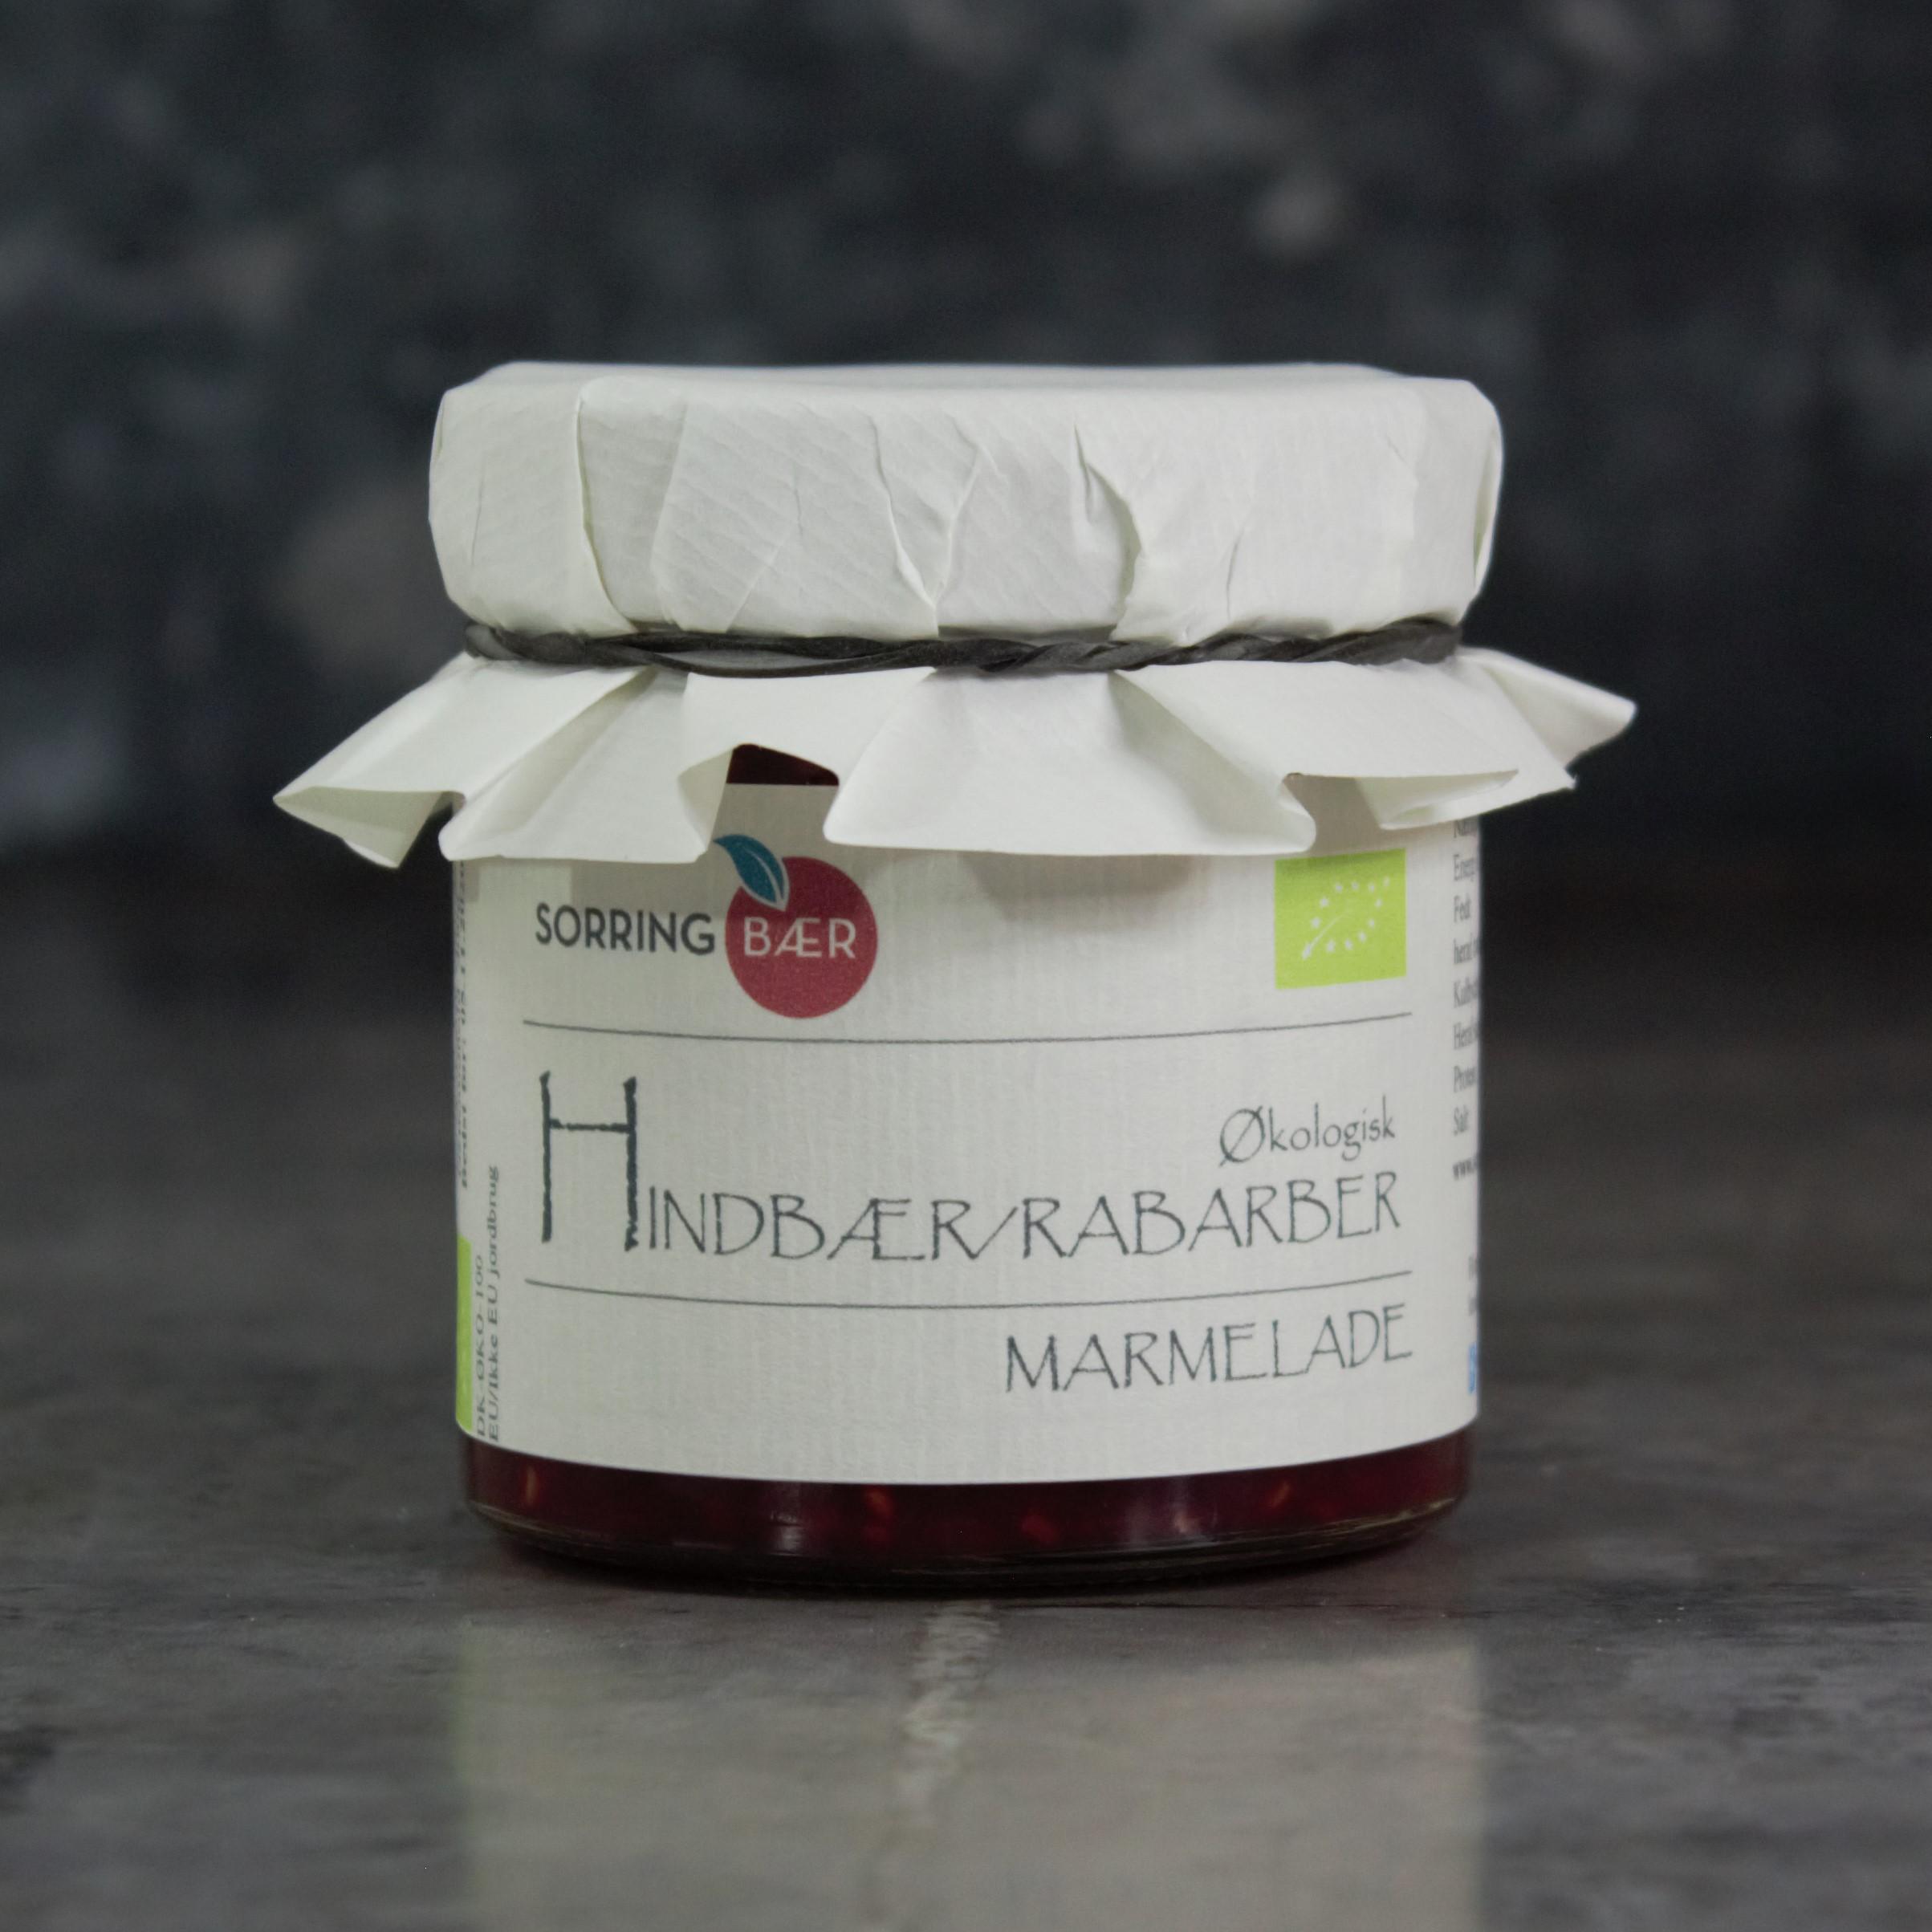 Økologisk hindbær/rabarbermarmelade